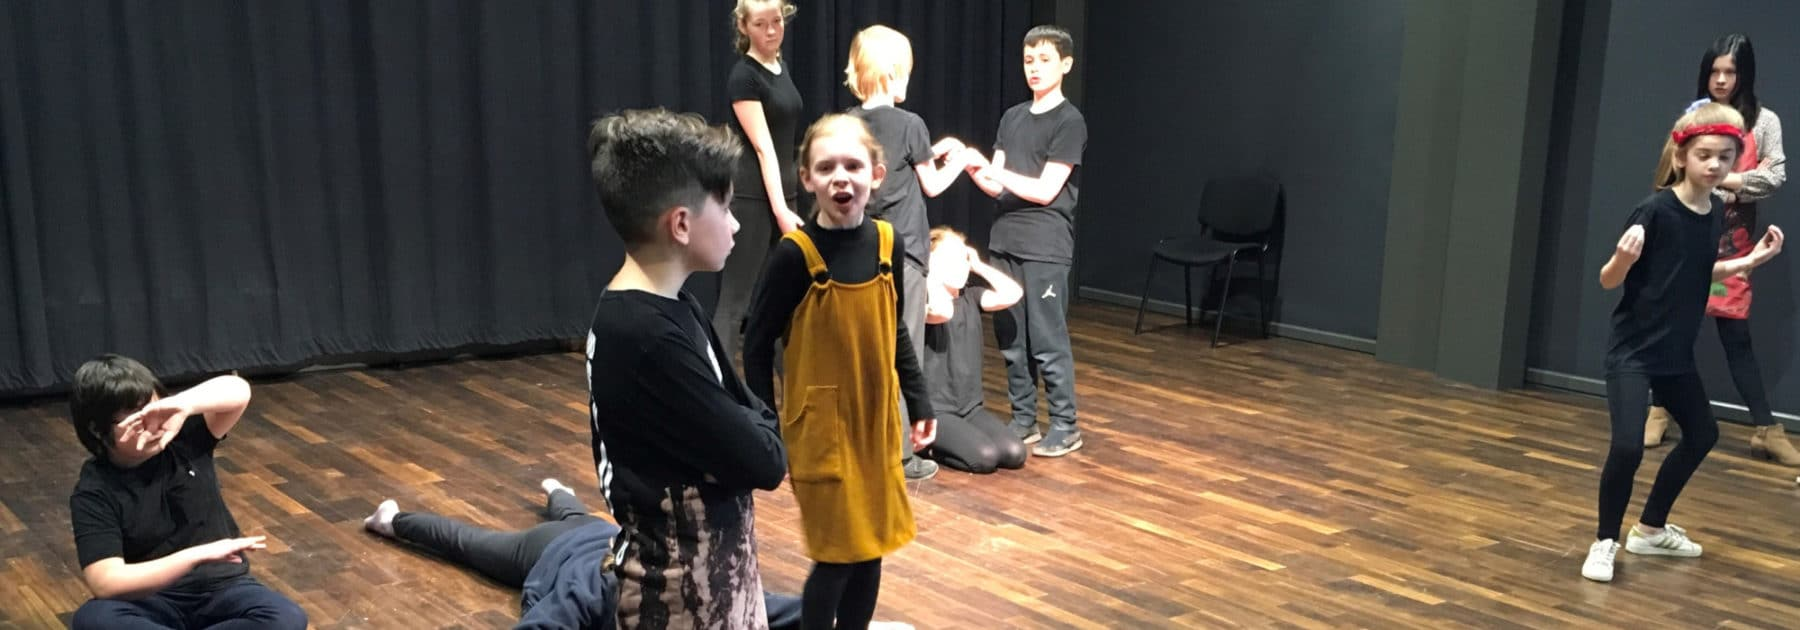 St John's Drama Group